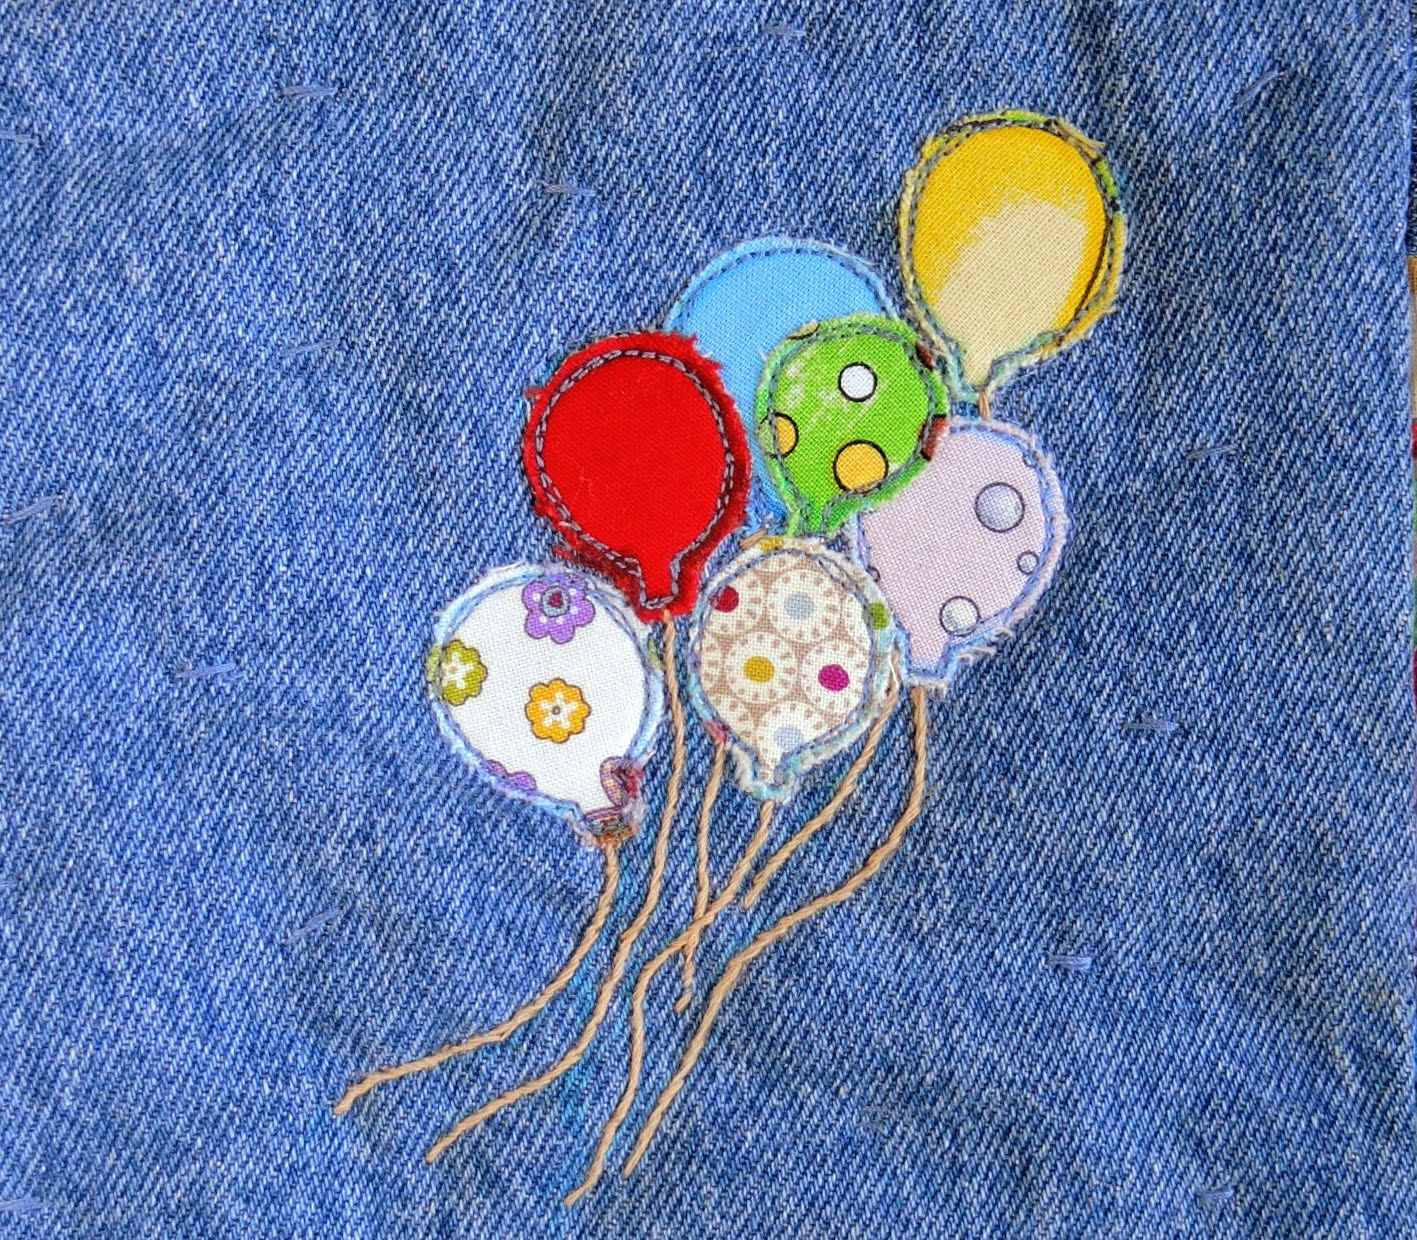 patchwork.jpg, quilt.jpg, лоскутное шитье, лоскутное шитье для начинающих, шитье из лоскутков, лоскутное шитье красиво, лоскутное шитье фото, лоскутная техника, шитье для начинающих, техника пэчворк, пэчворк для начинающих, квилтинг, пэчворк подушки, аппликация, хлопок , джинс, patchwork, quilt, pillowcase, pillow